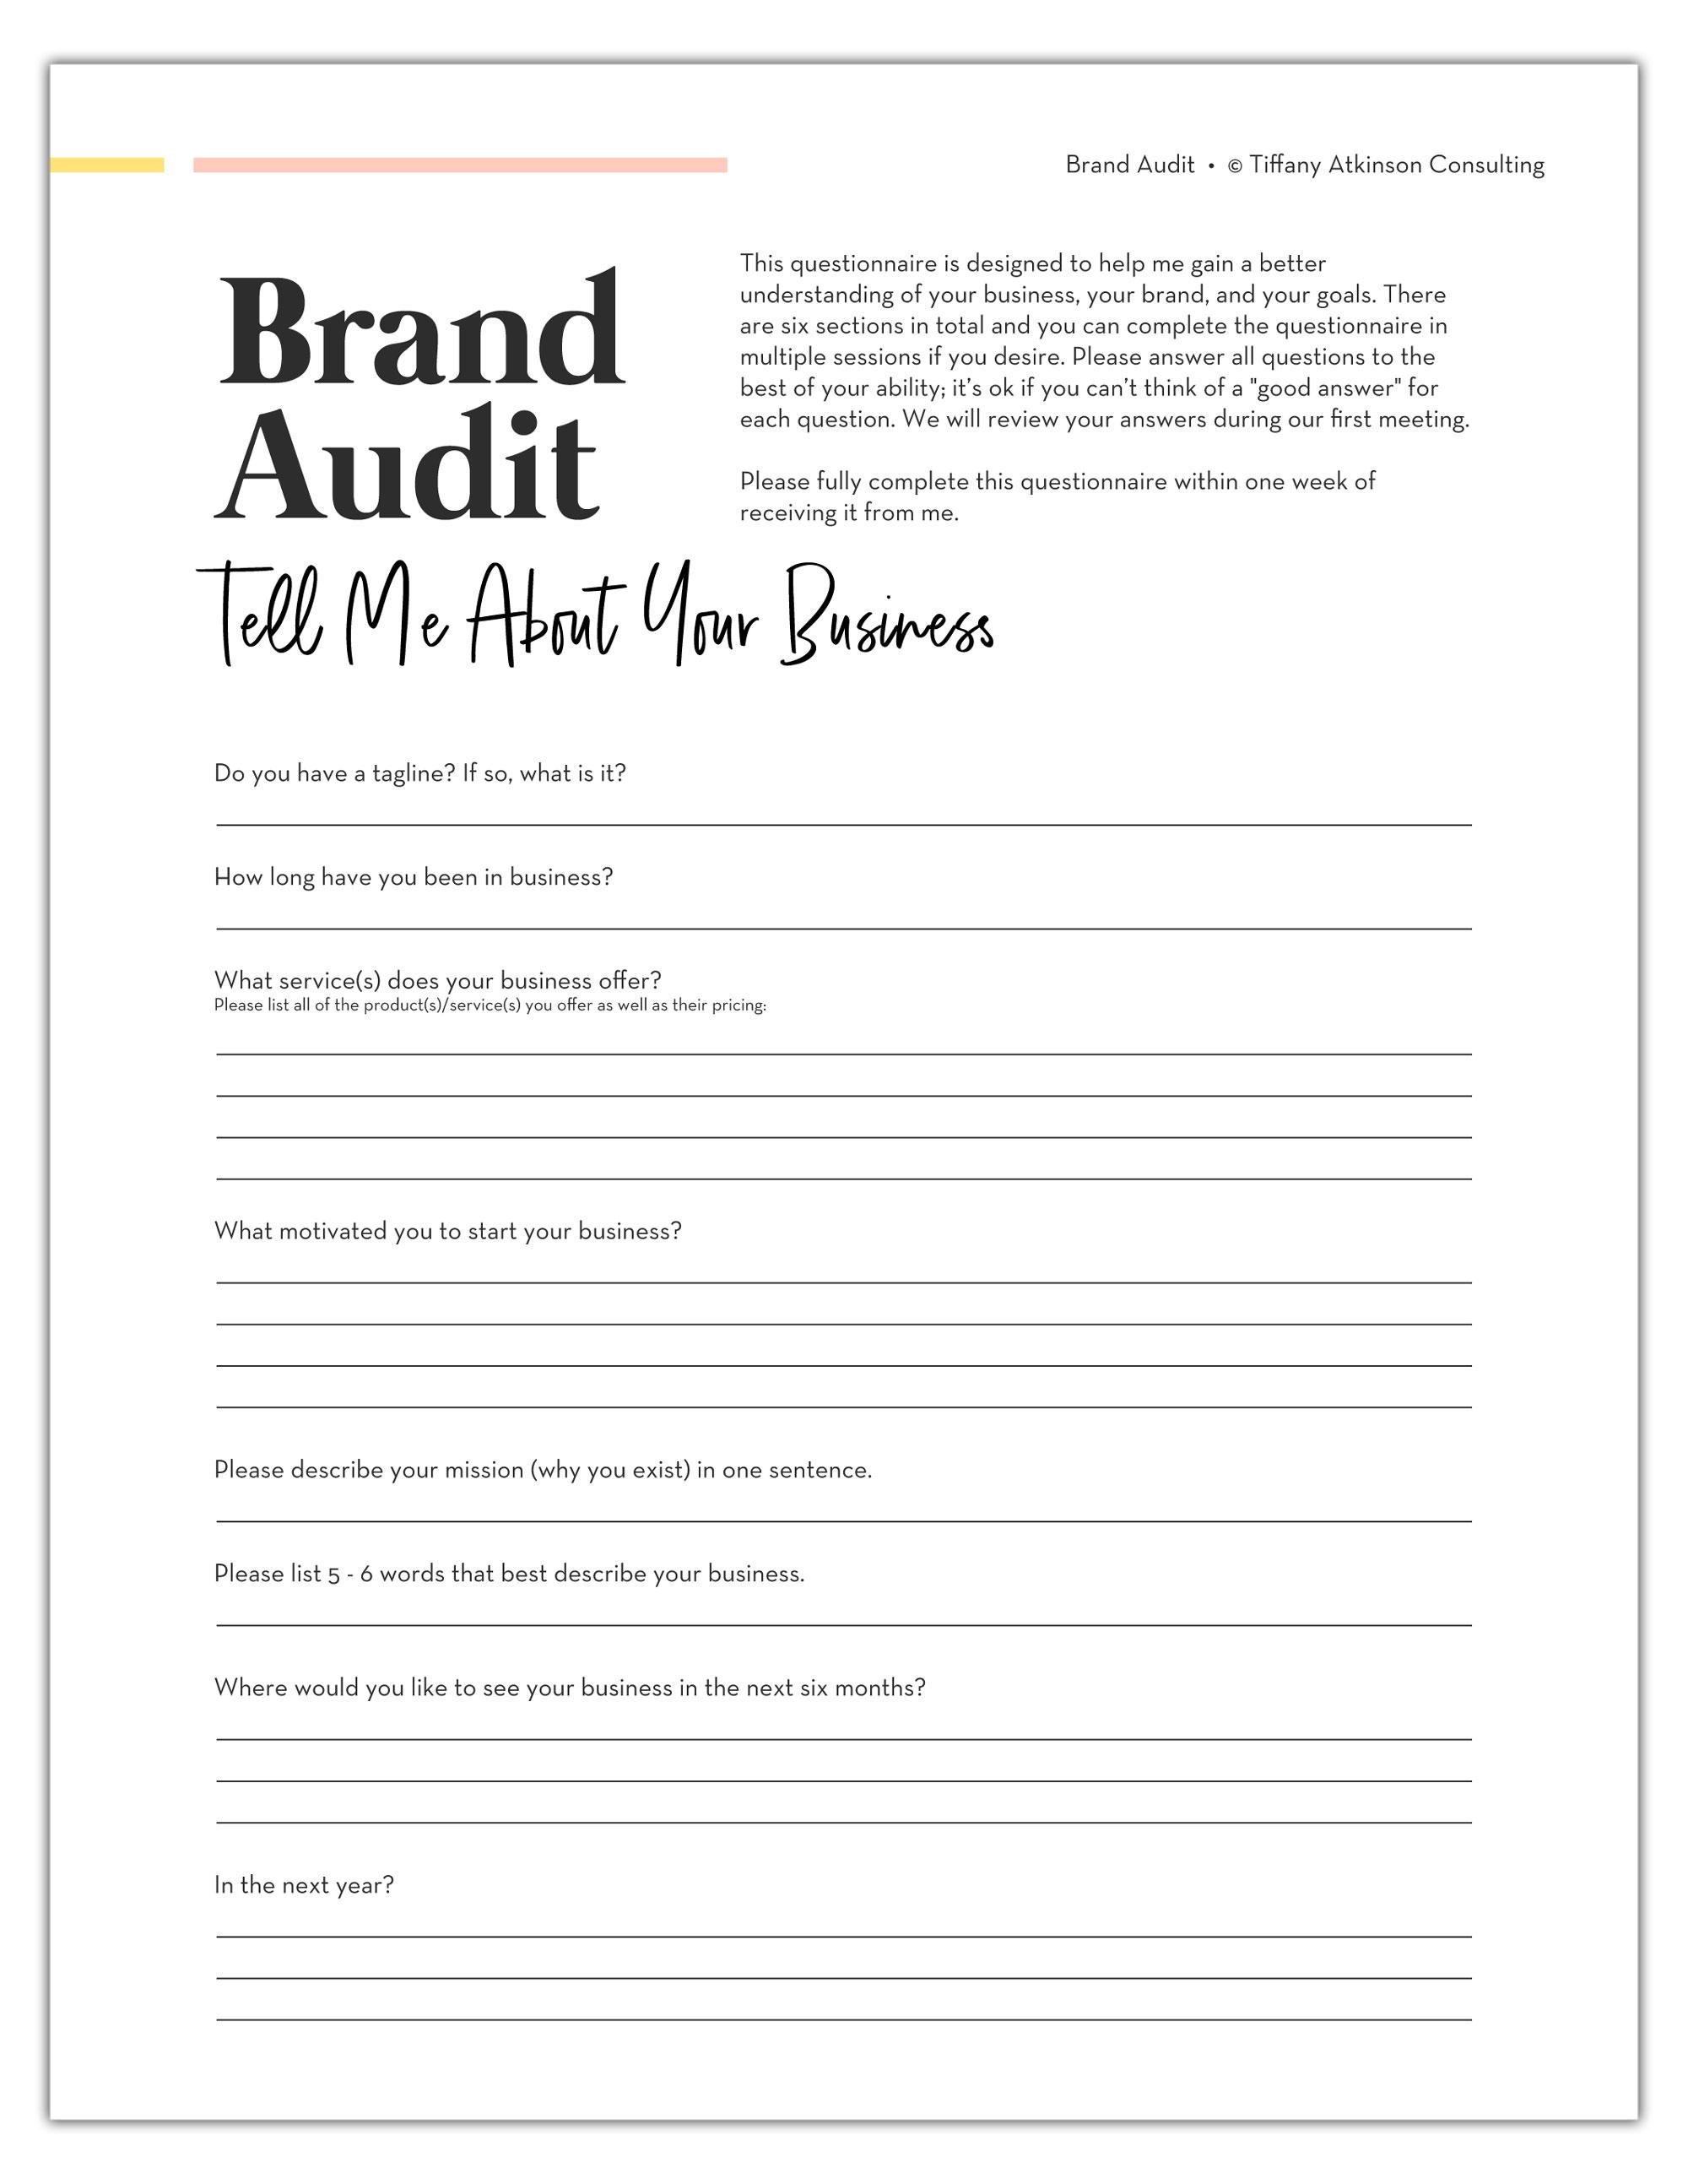 Personalized Brand Audit | Tiffany Atkinson Consulting | tiffanyatkinson.com